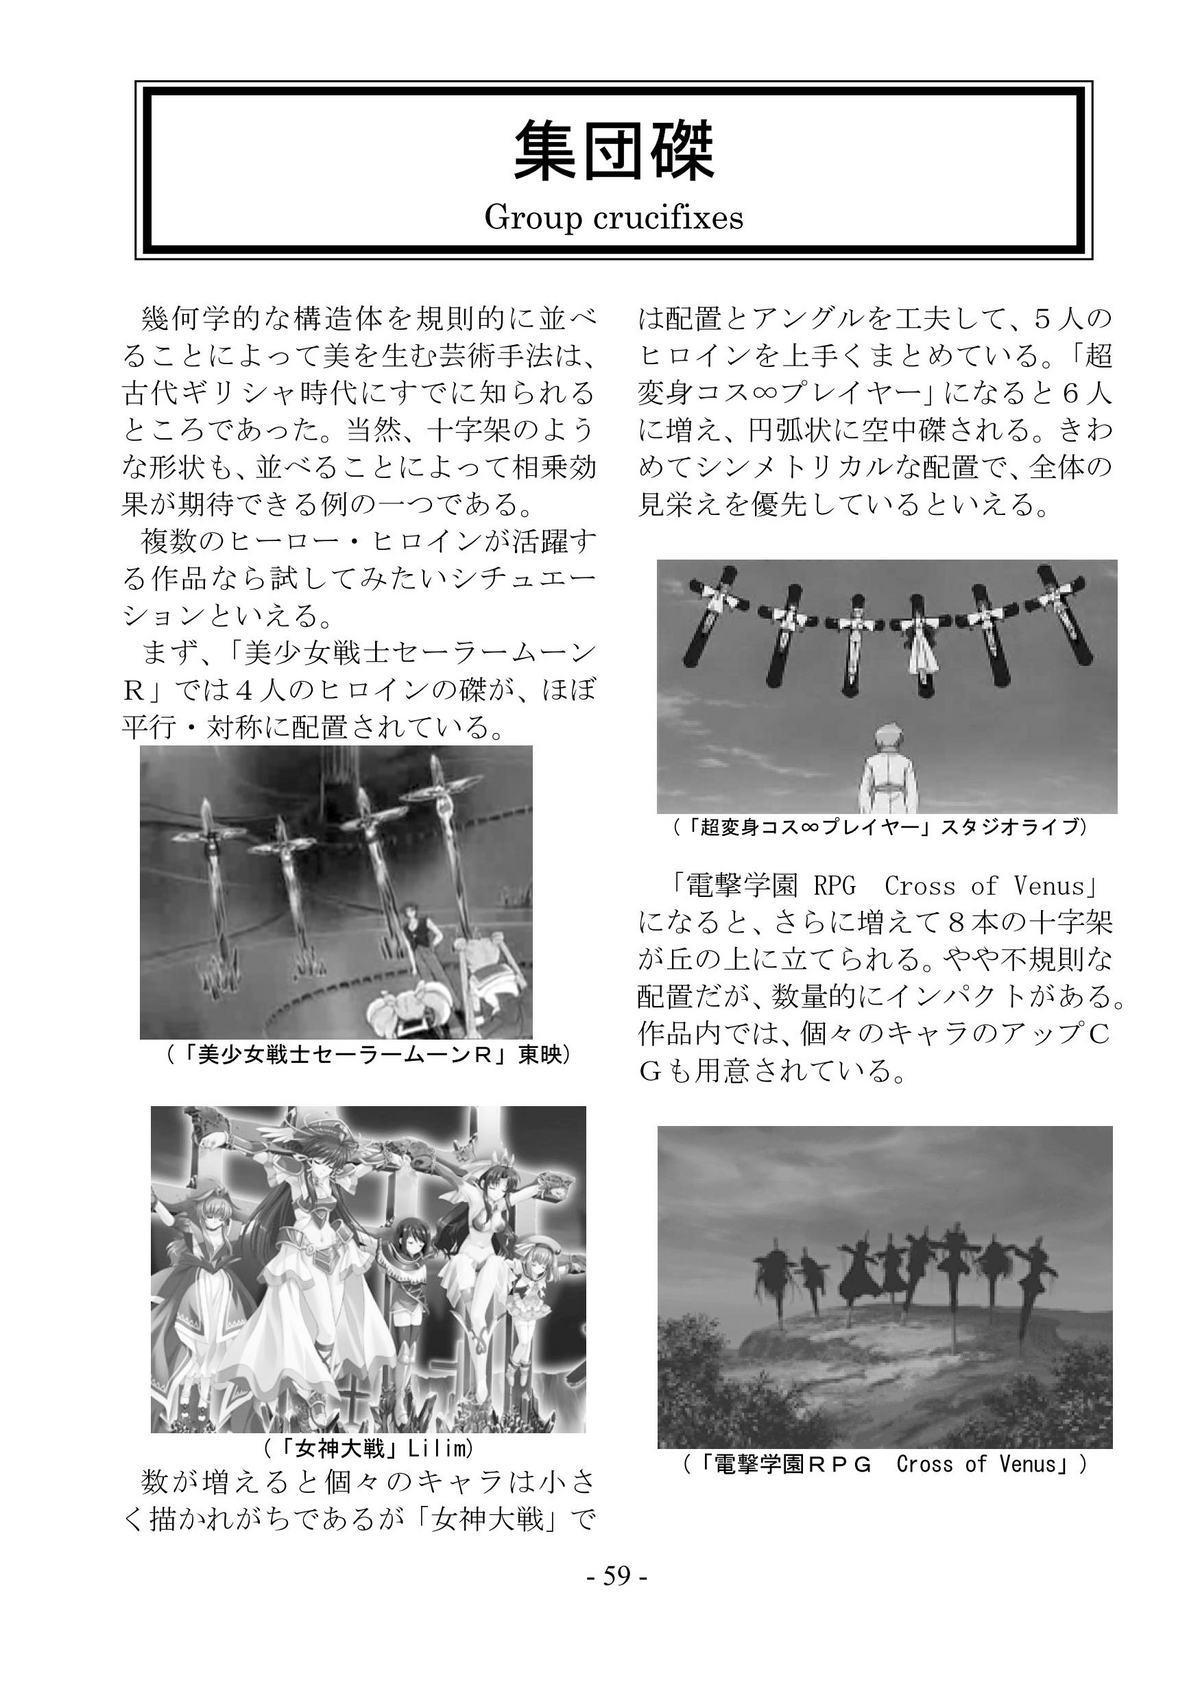 encyclopedia of crucifixion 59